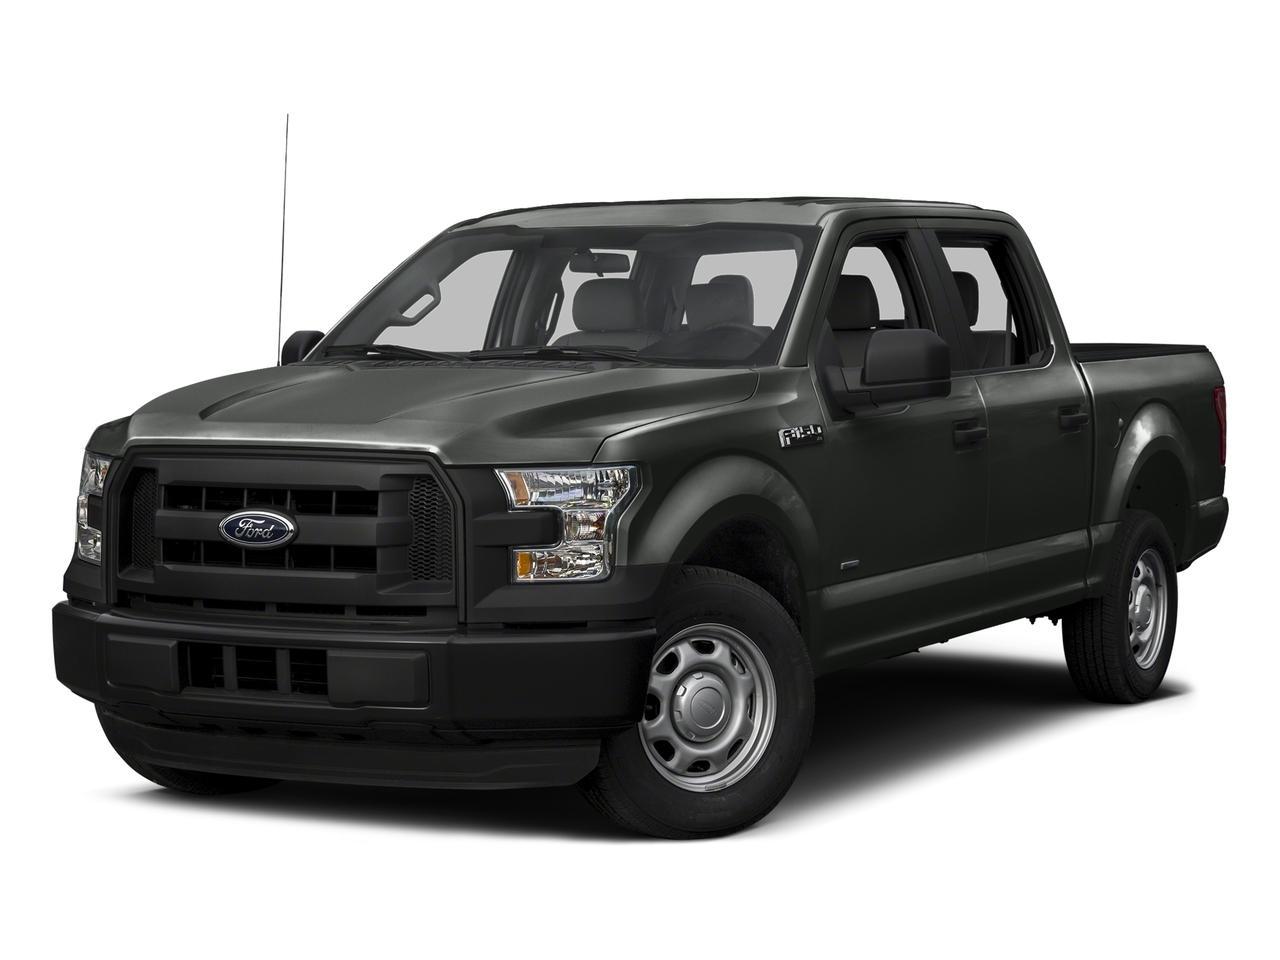 2015 Ford F-150 Vehicle Photo in Twin Falls, ID 83301